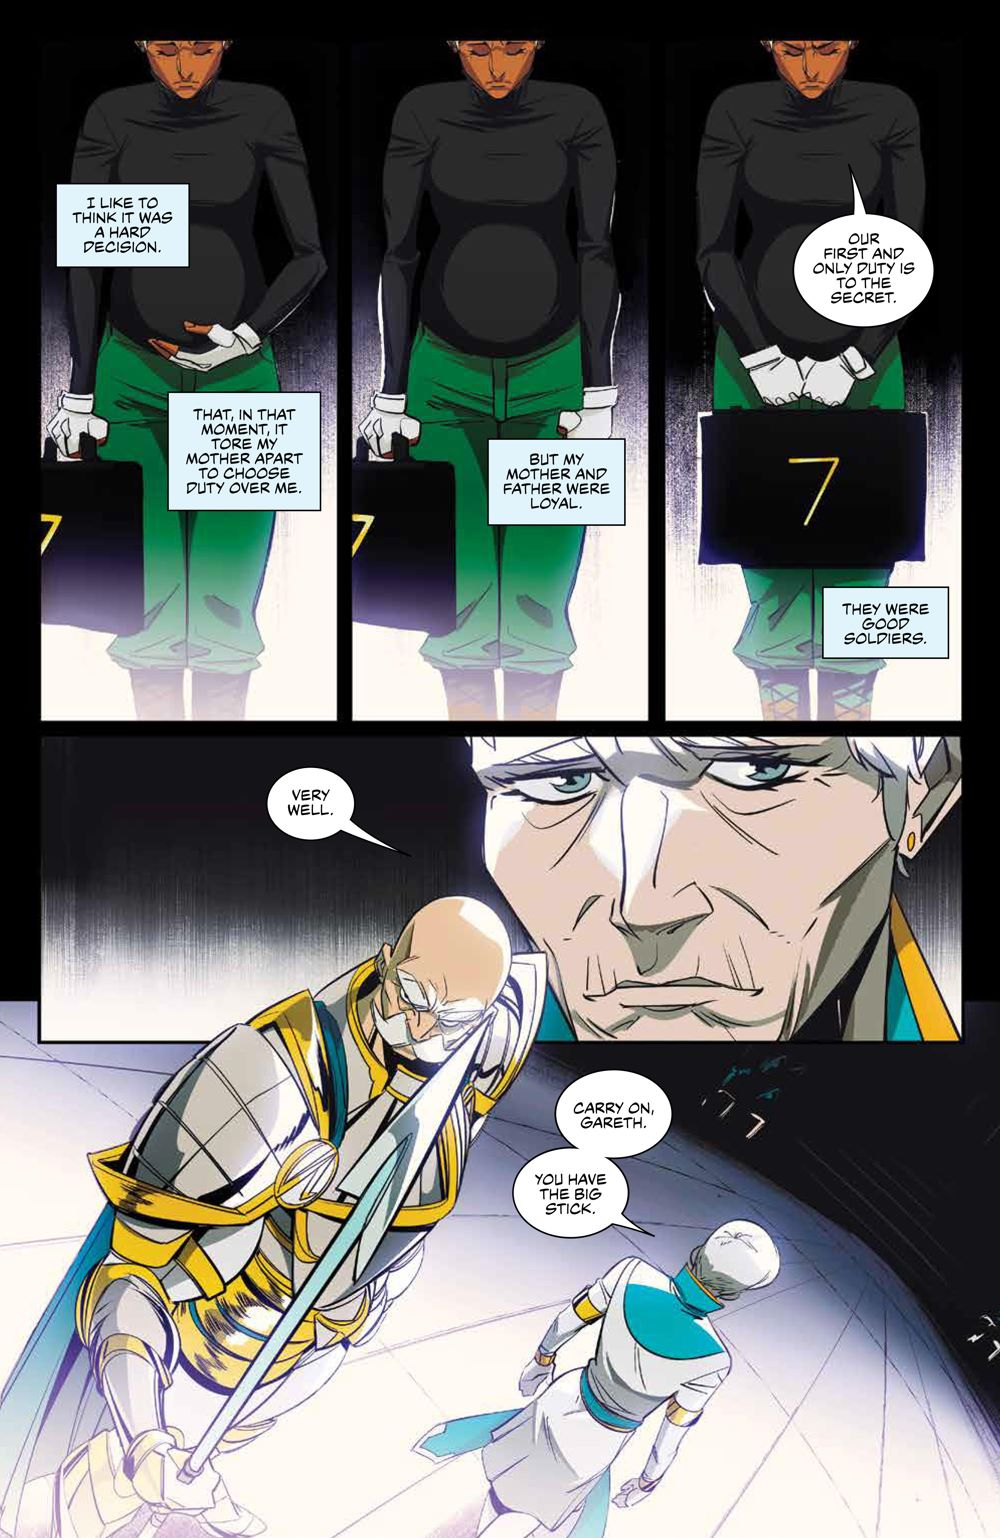 SevenSecrets_v1_SC_PRESS_20 ComicList Previews: SEVEN SECRETS VOLUME 1 TP